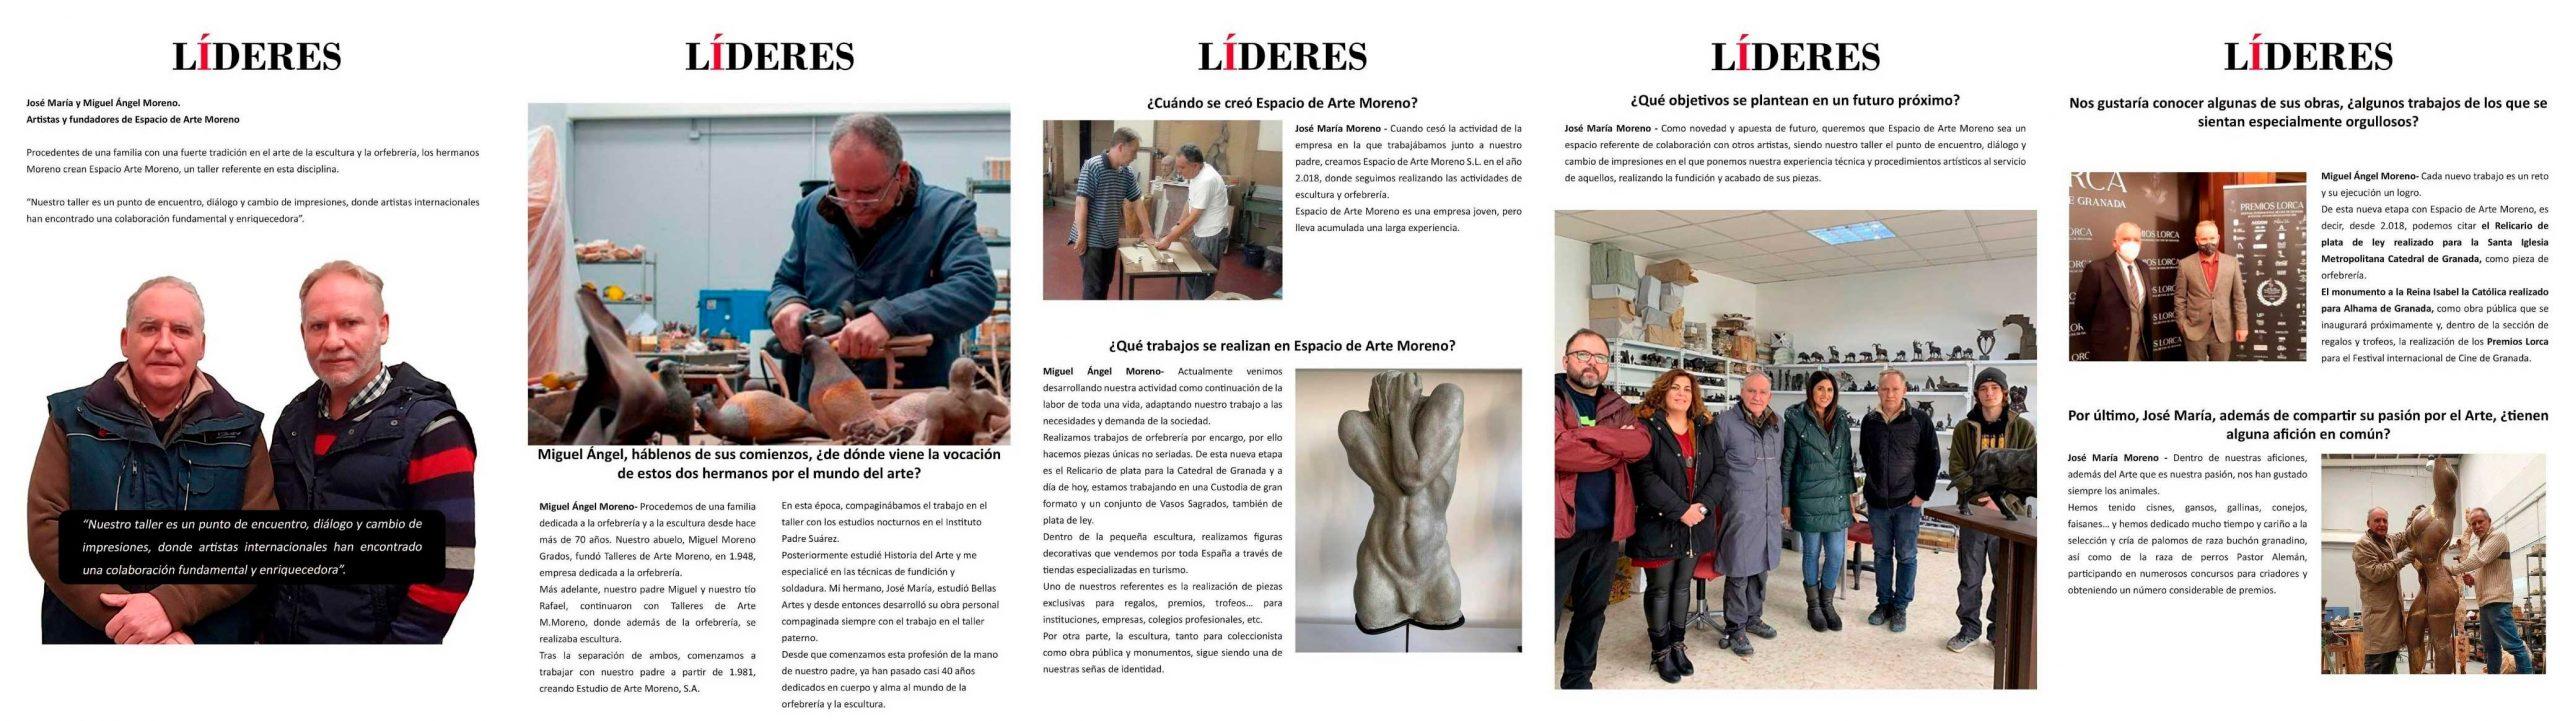 Portada-Entrevista-Lideres